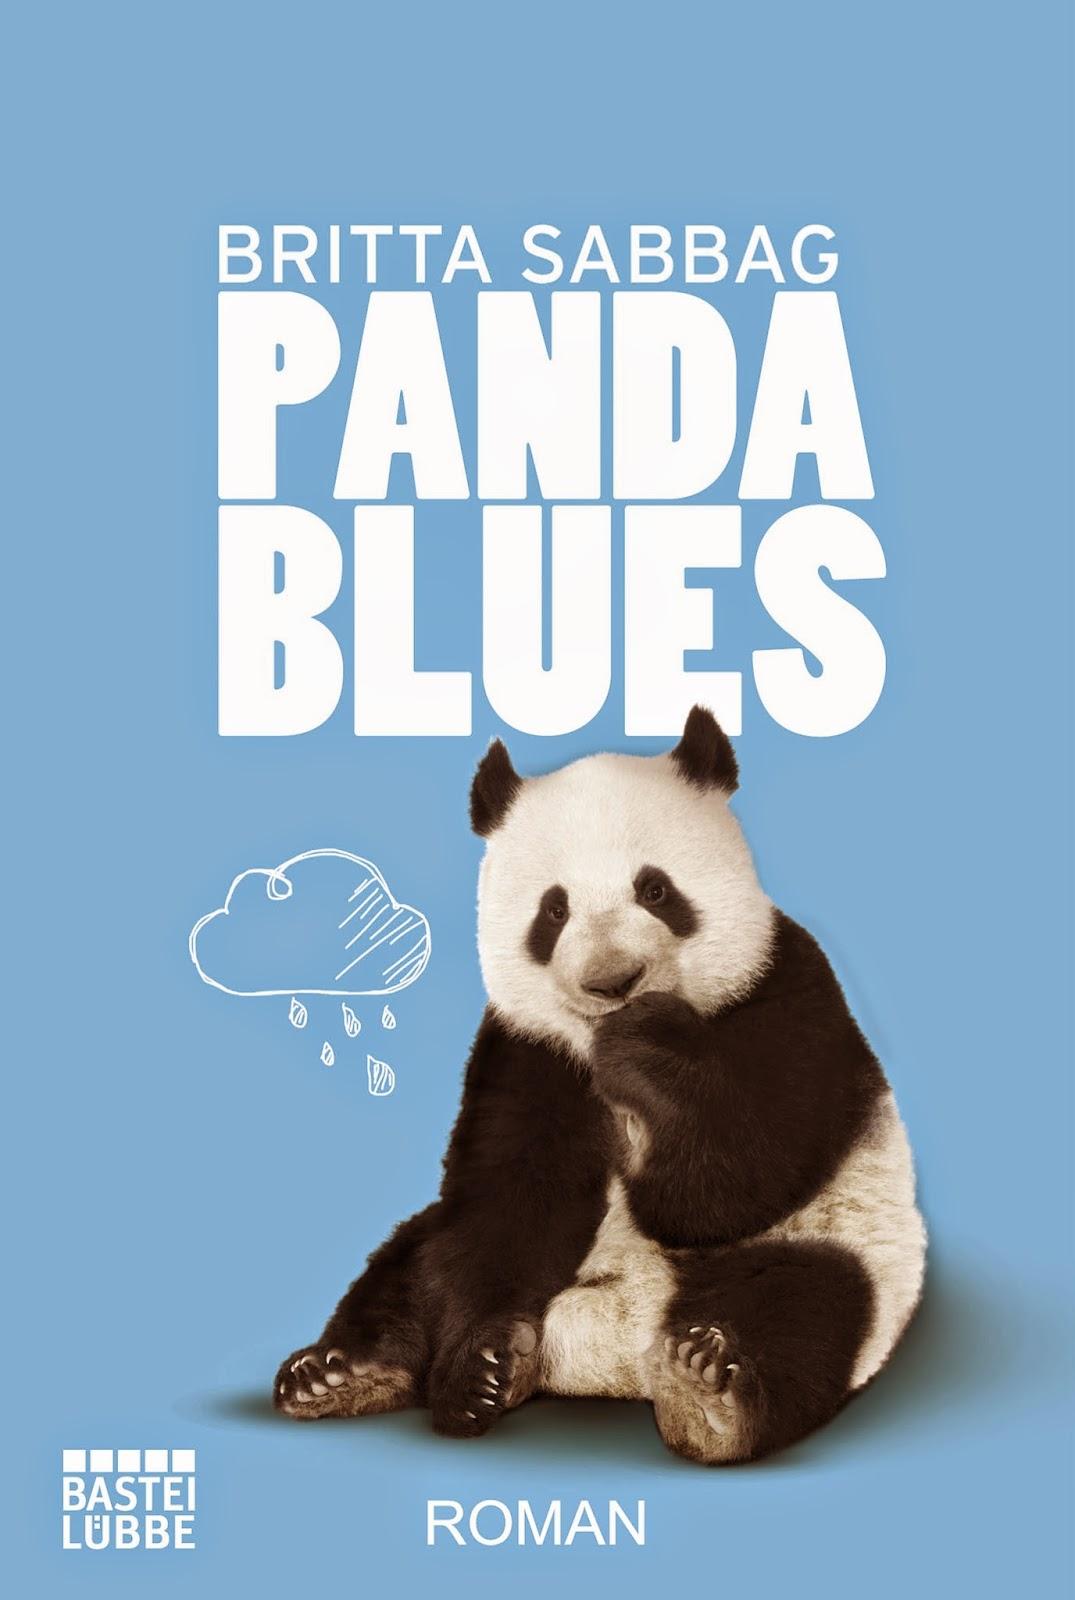 http://www.amazon.de/Pandablues-Roman-Britta-Sabbag/dp/3404168054/ref=pd_sim_b_1?ie=UTF8&refRID=16476X9F4W7VVZ97MBTV